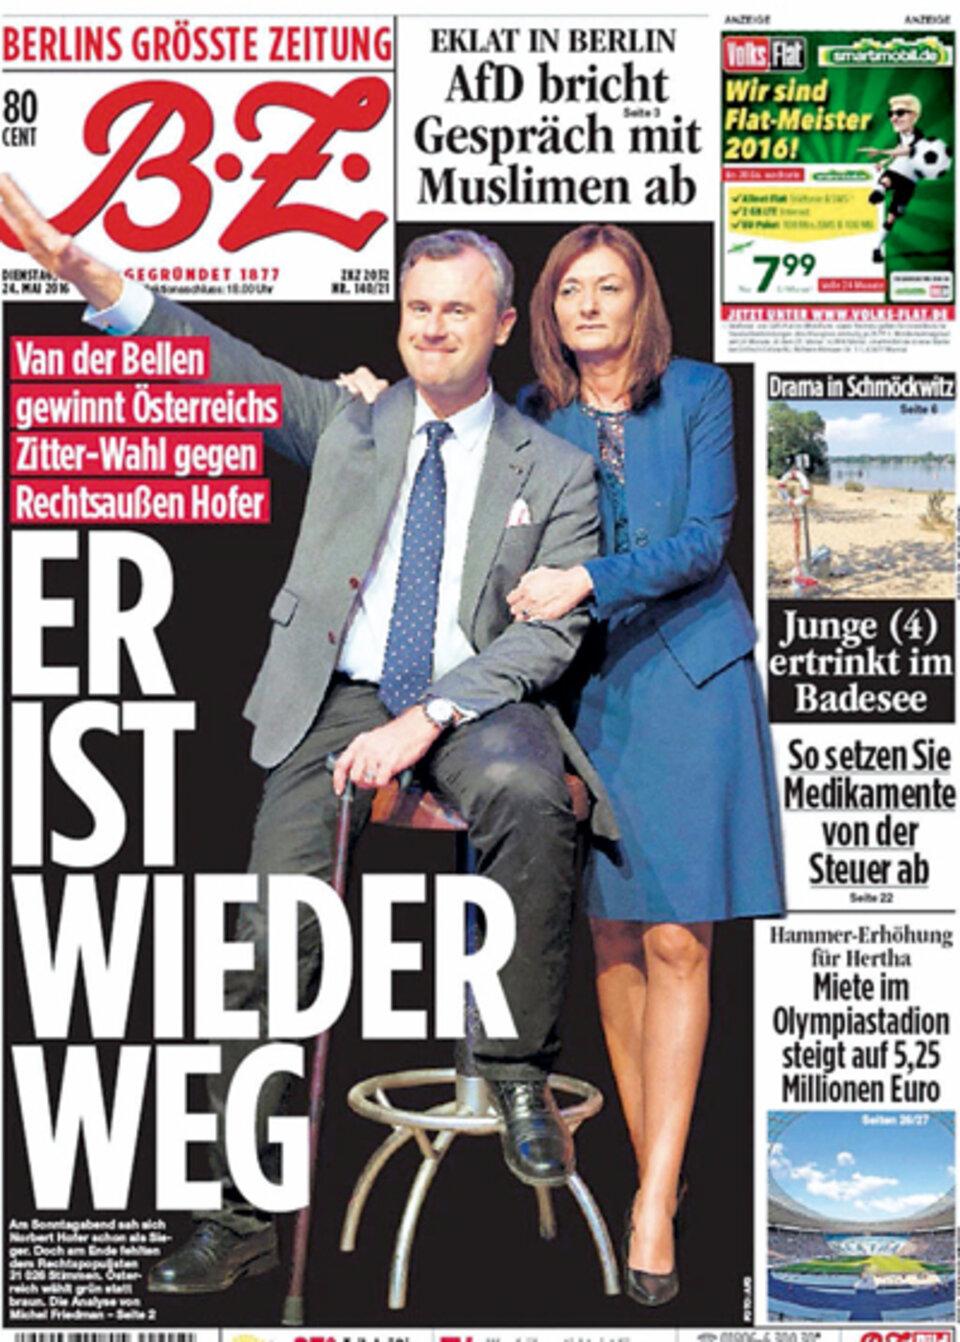 Berliner Zeitung Vergleicht Norbert Hofer Mit Adolf Hitler